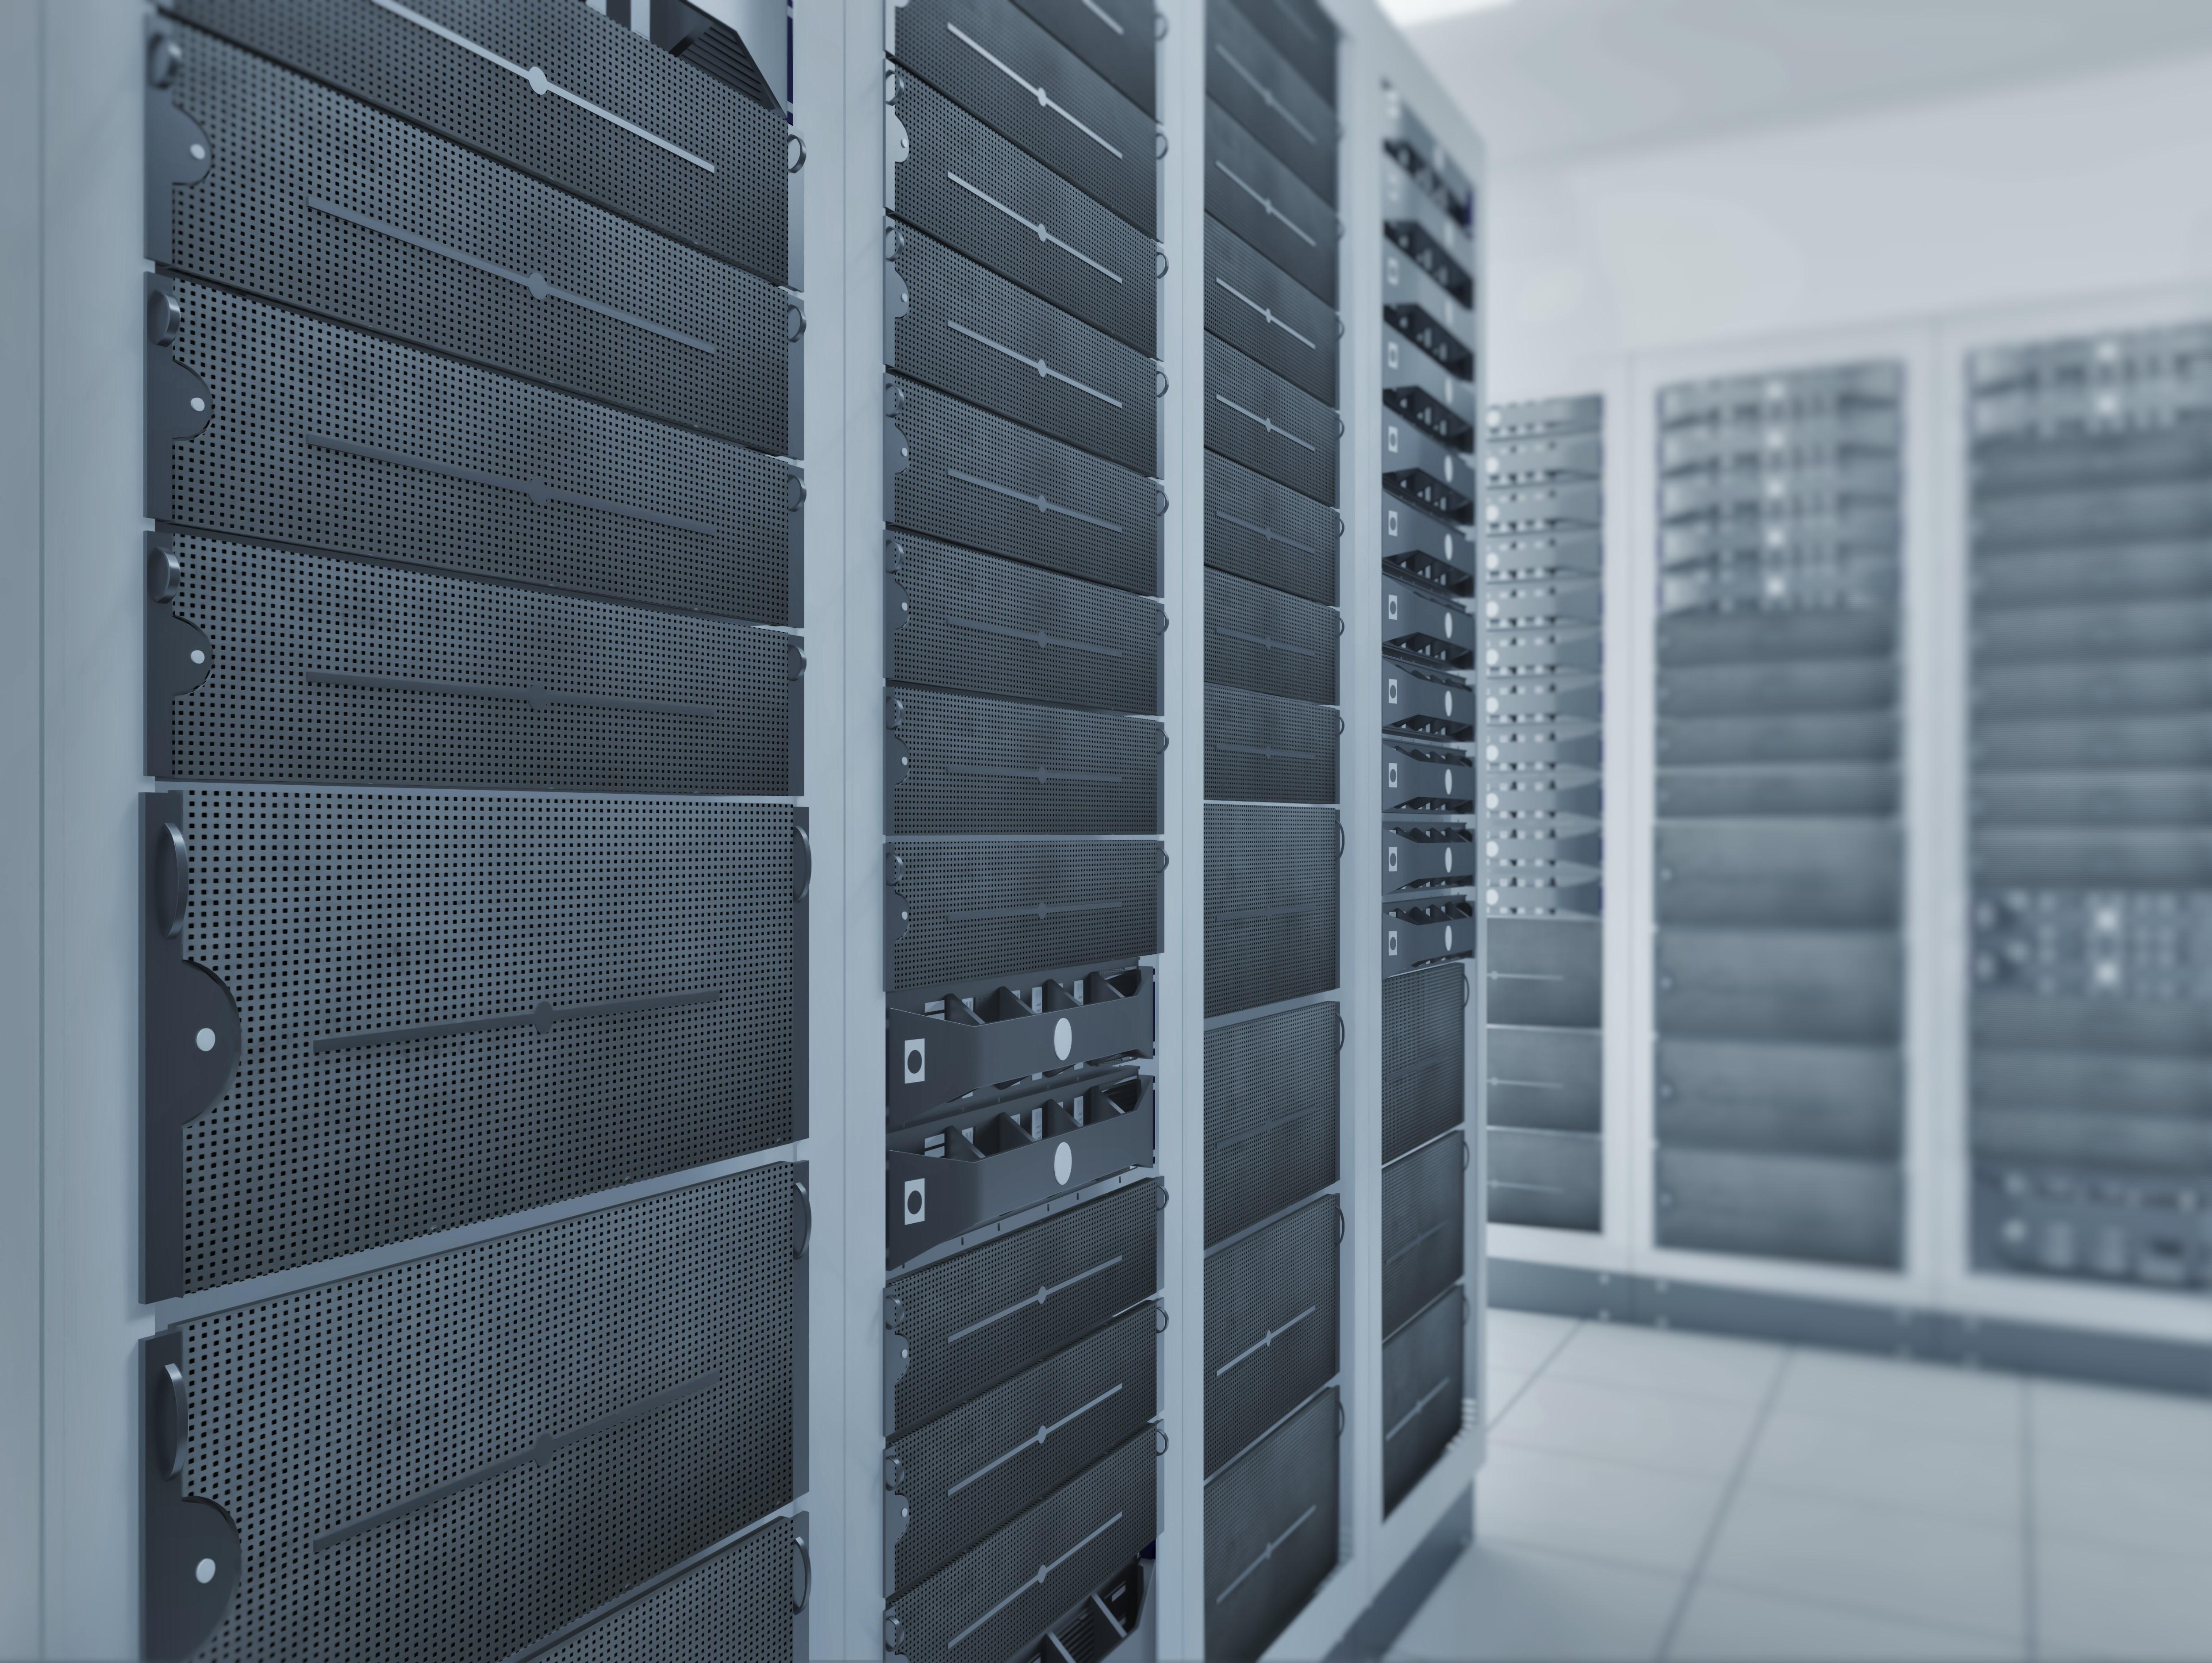 network-server-room-PW46XSN-2.jpg